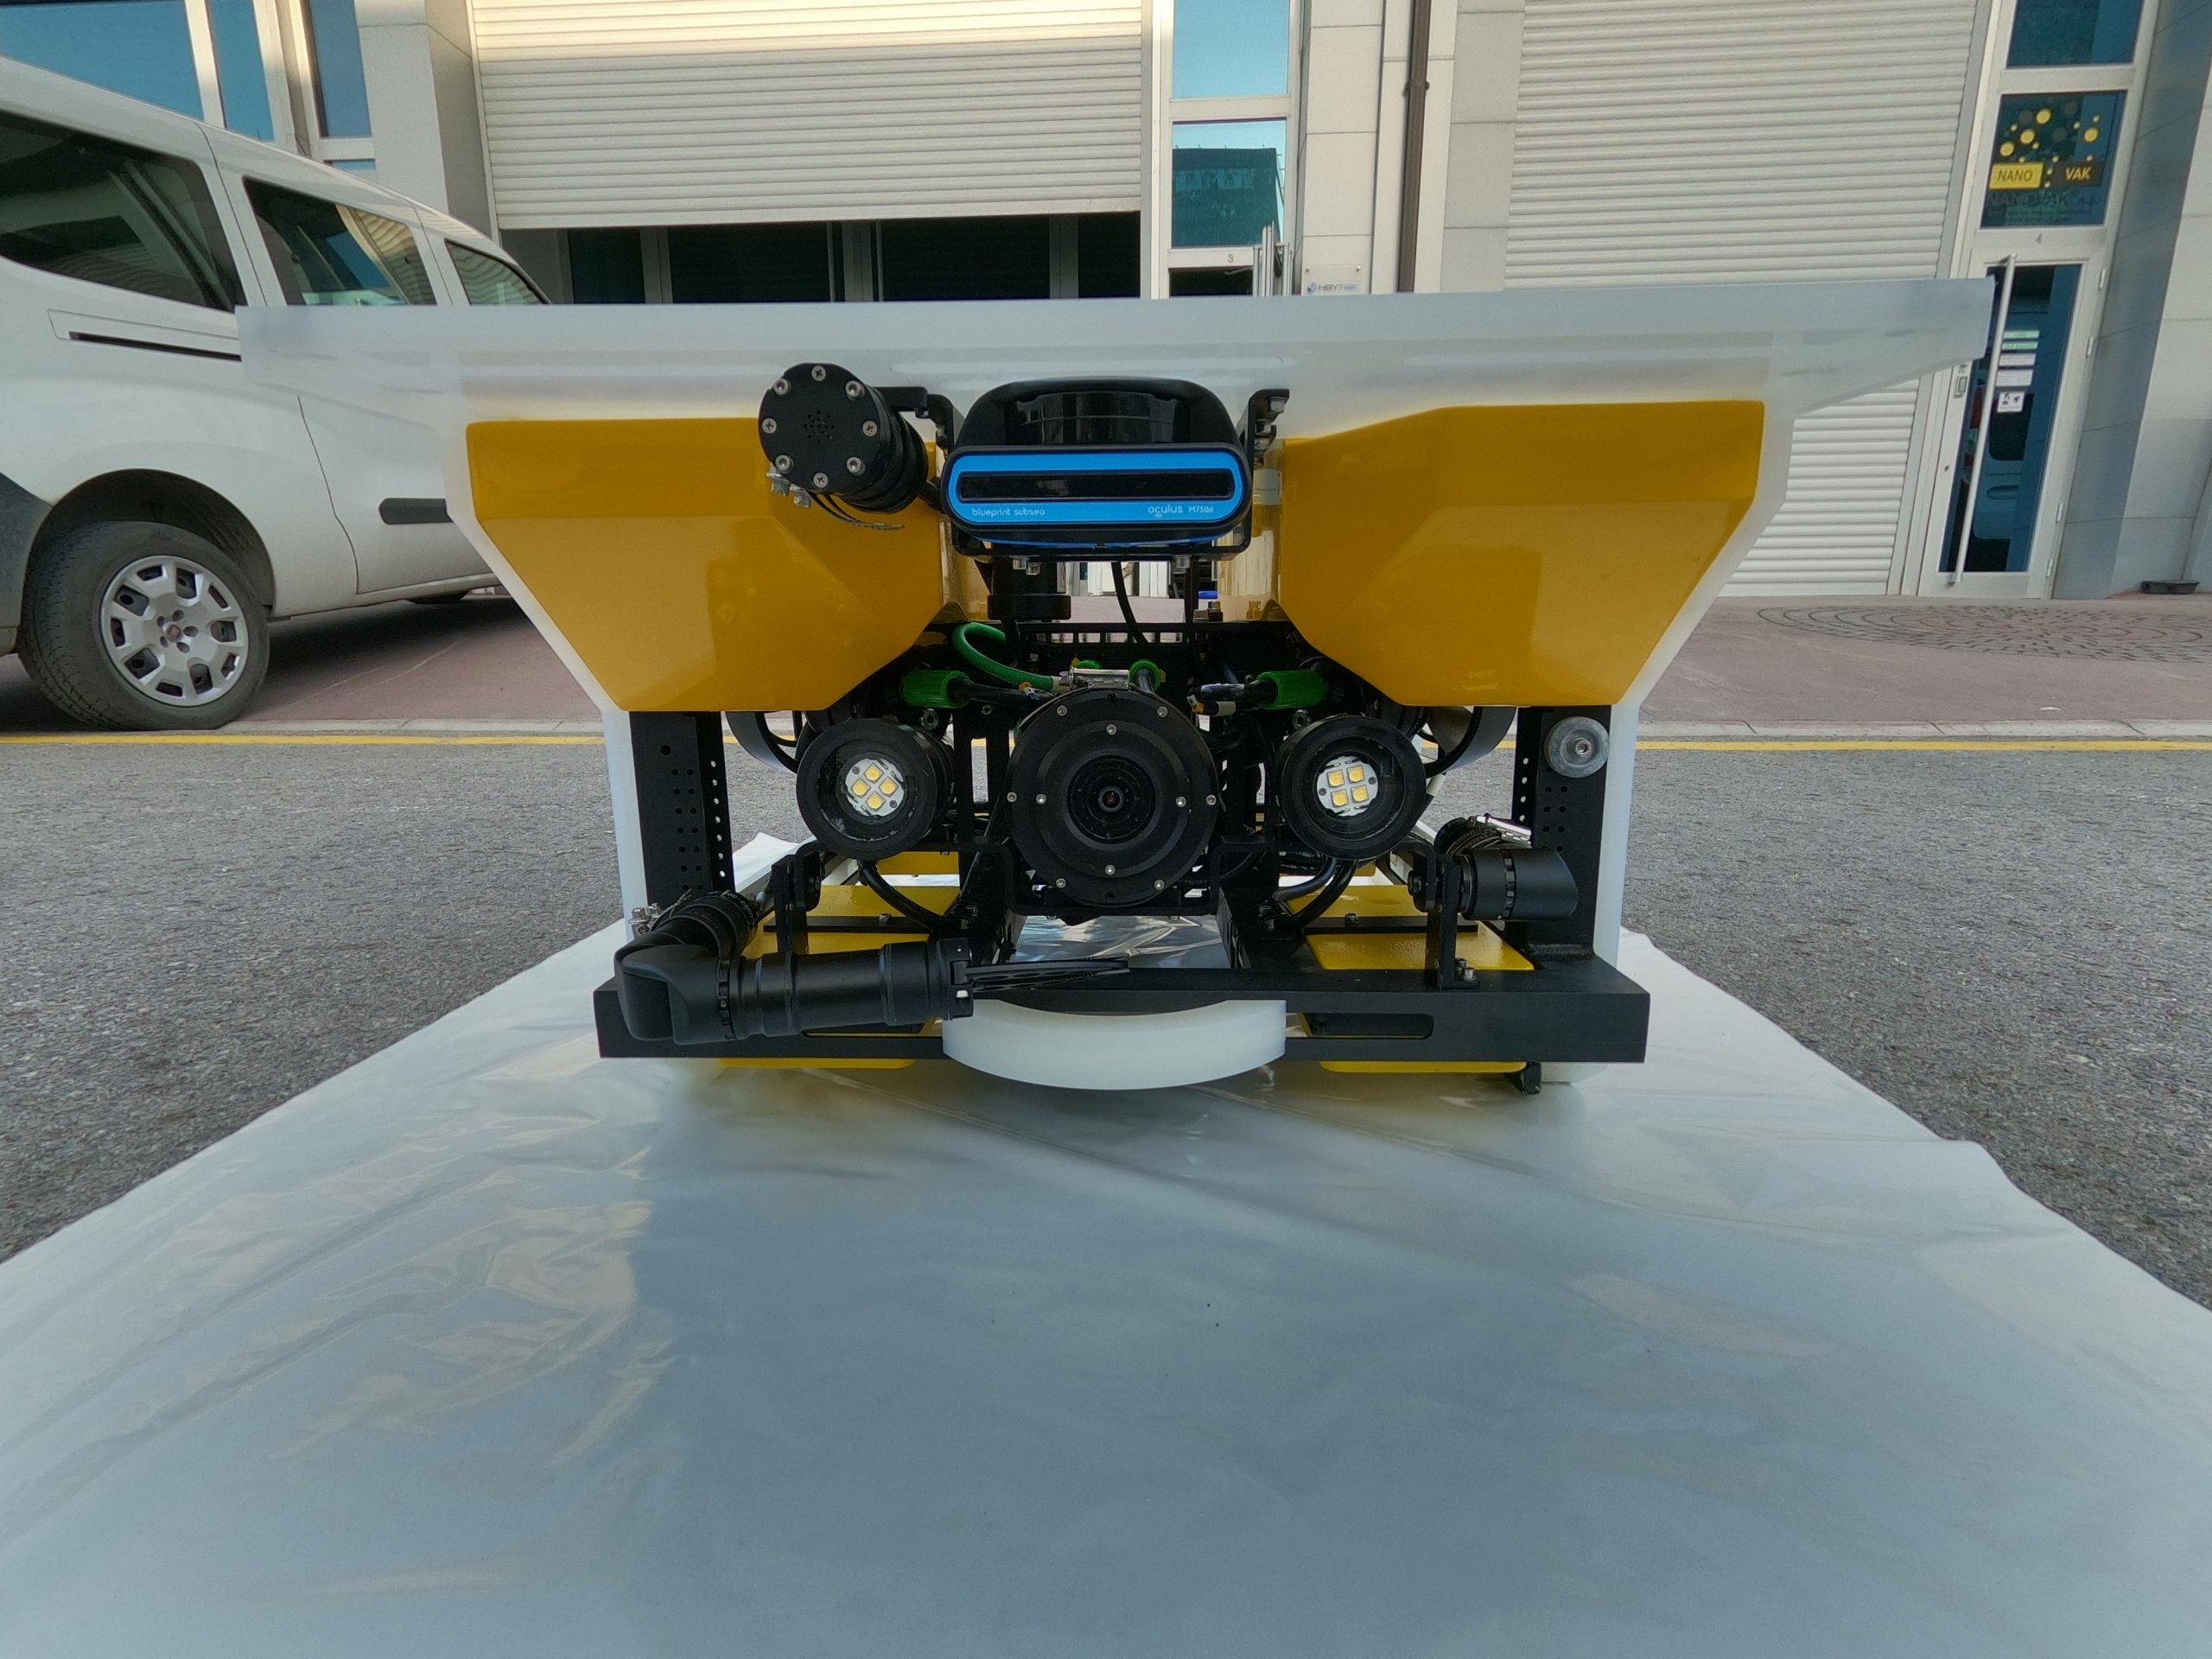 Hoytek ROV with Blueprint Lab's Alpha 3 robotic arm and Alpha Bend actuator for SAR